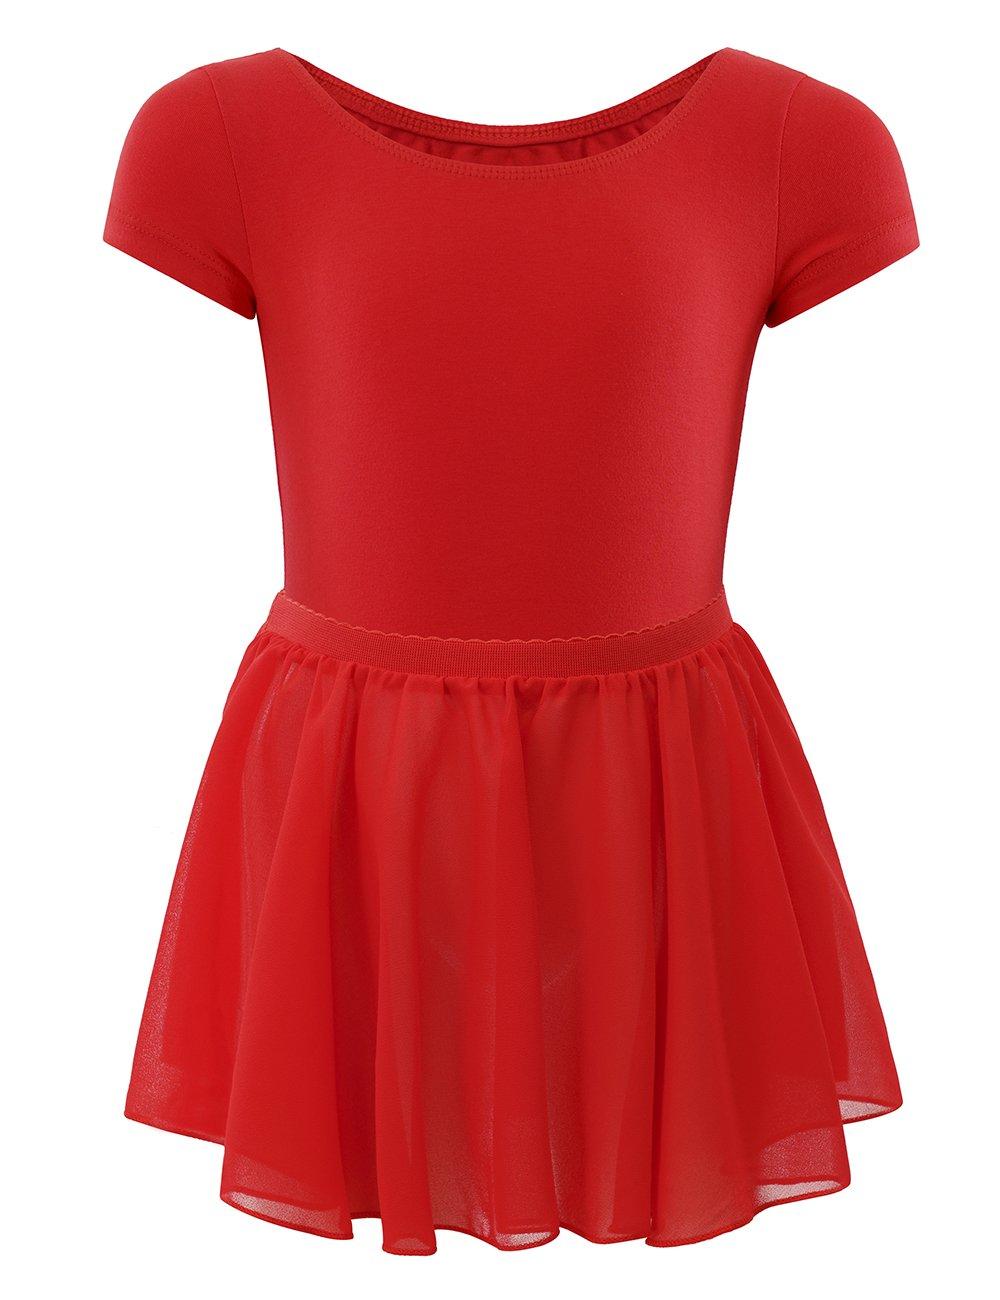 WEGETIT Skirted Leotard Toddler Girls Ballet Tutu Dress (6-8 Years, Red)